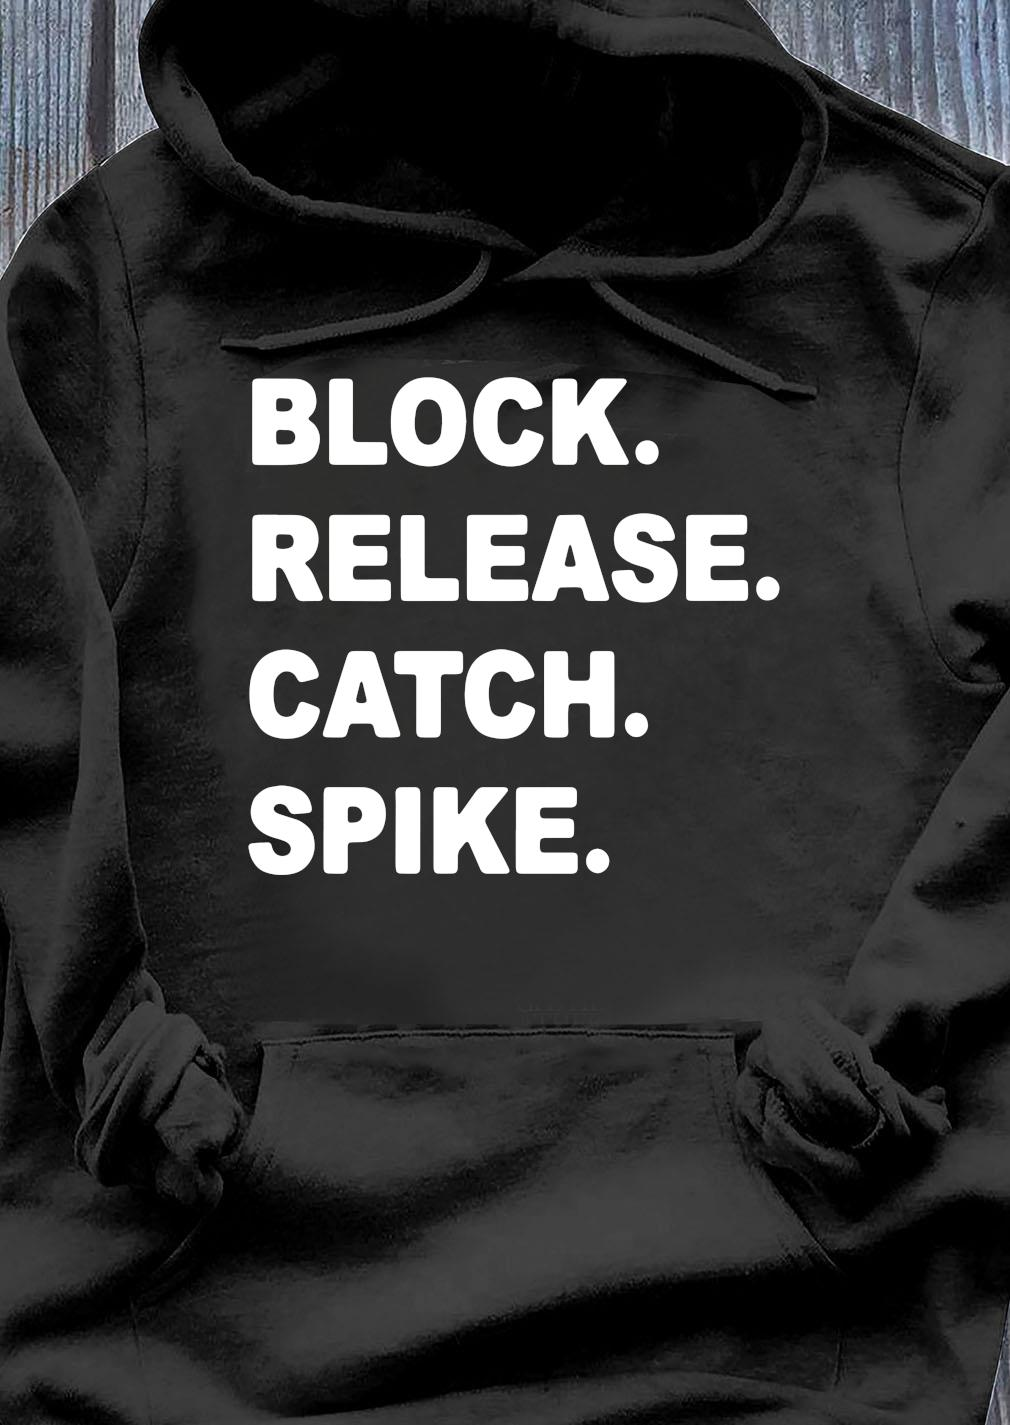 Official Block Release Catch Spike Shirt Hoodie